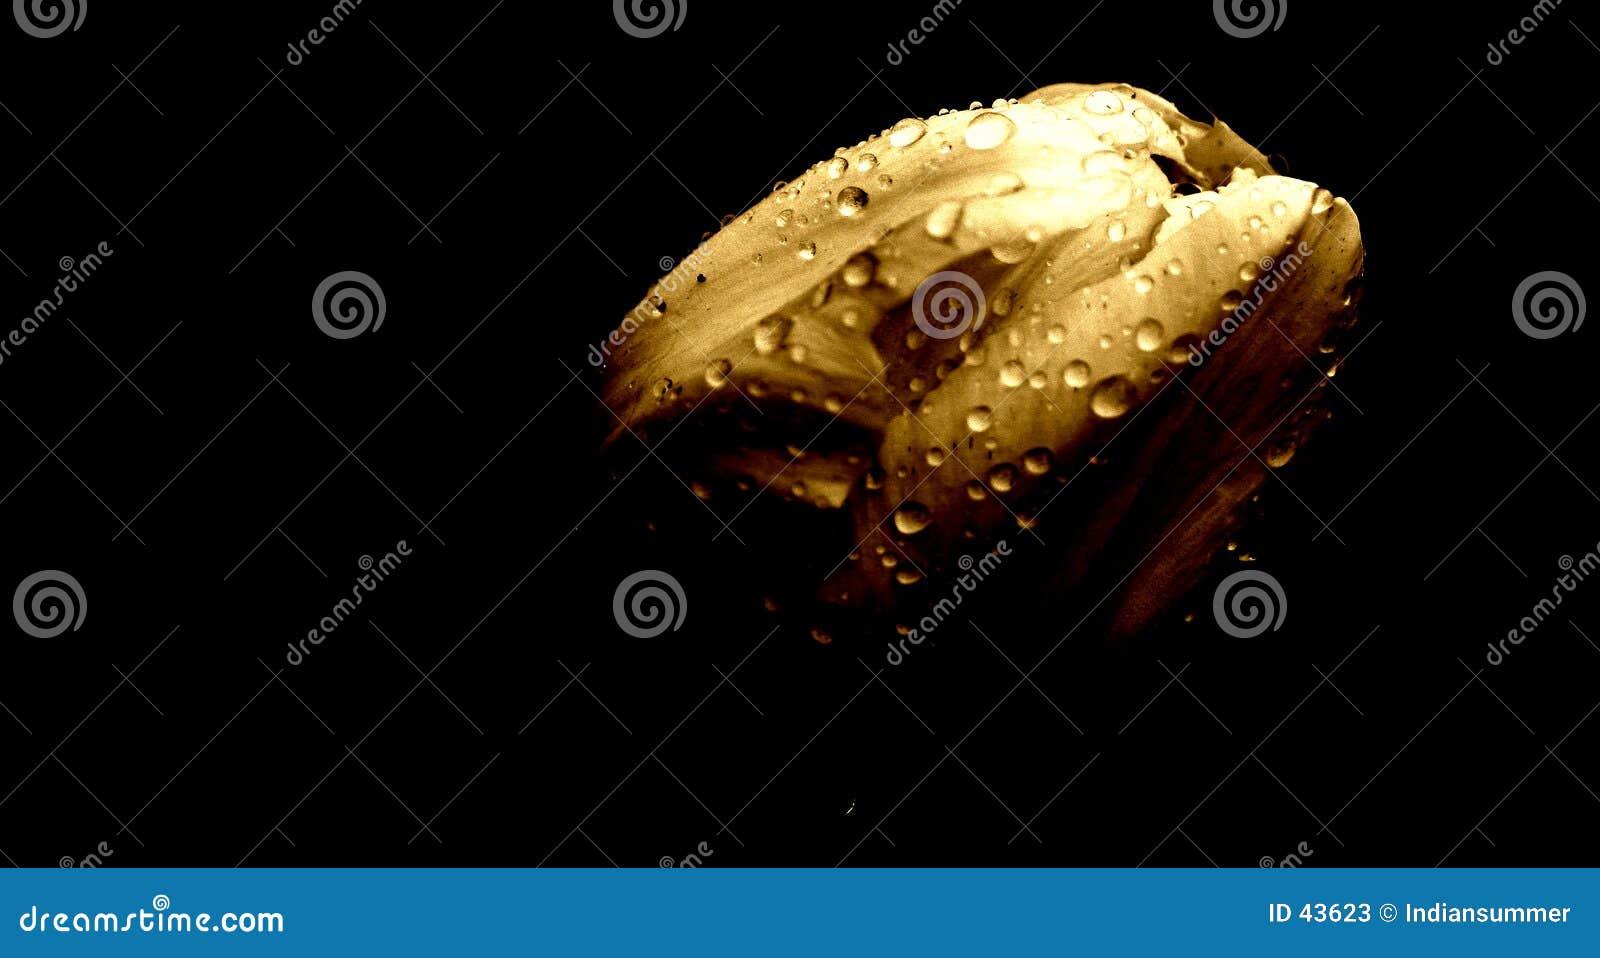 Download Tulipán en la lluvia imagen de archivo. Imagen de raindrop - 43623